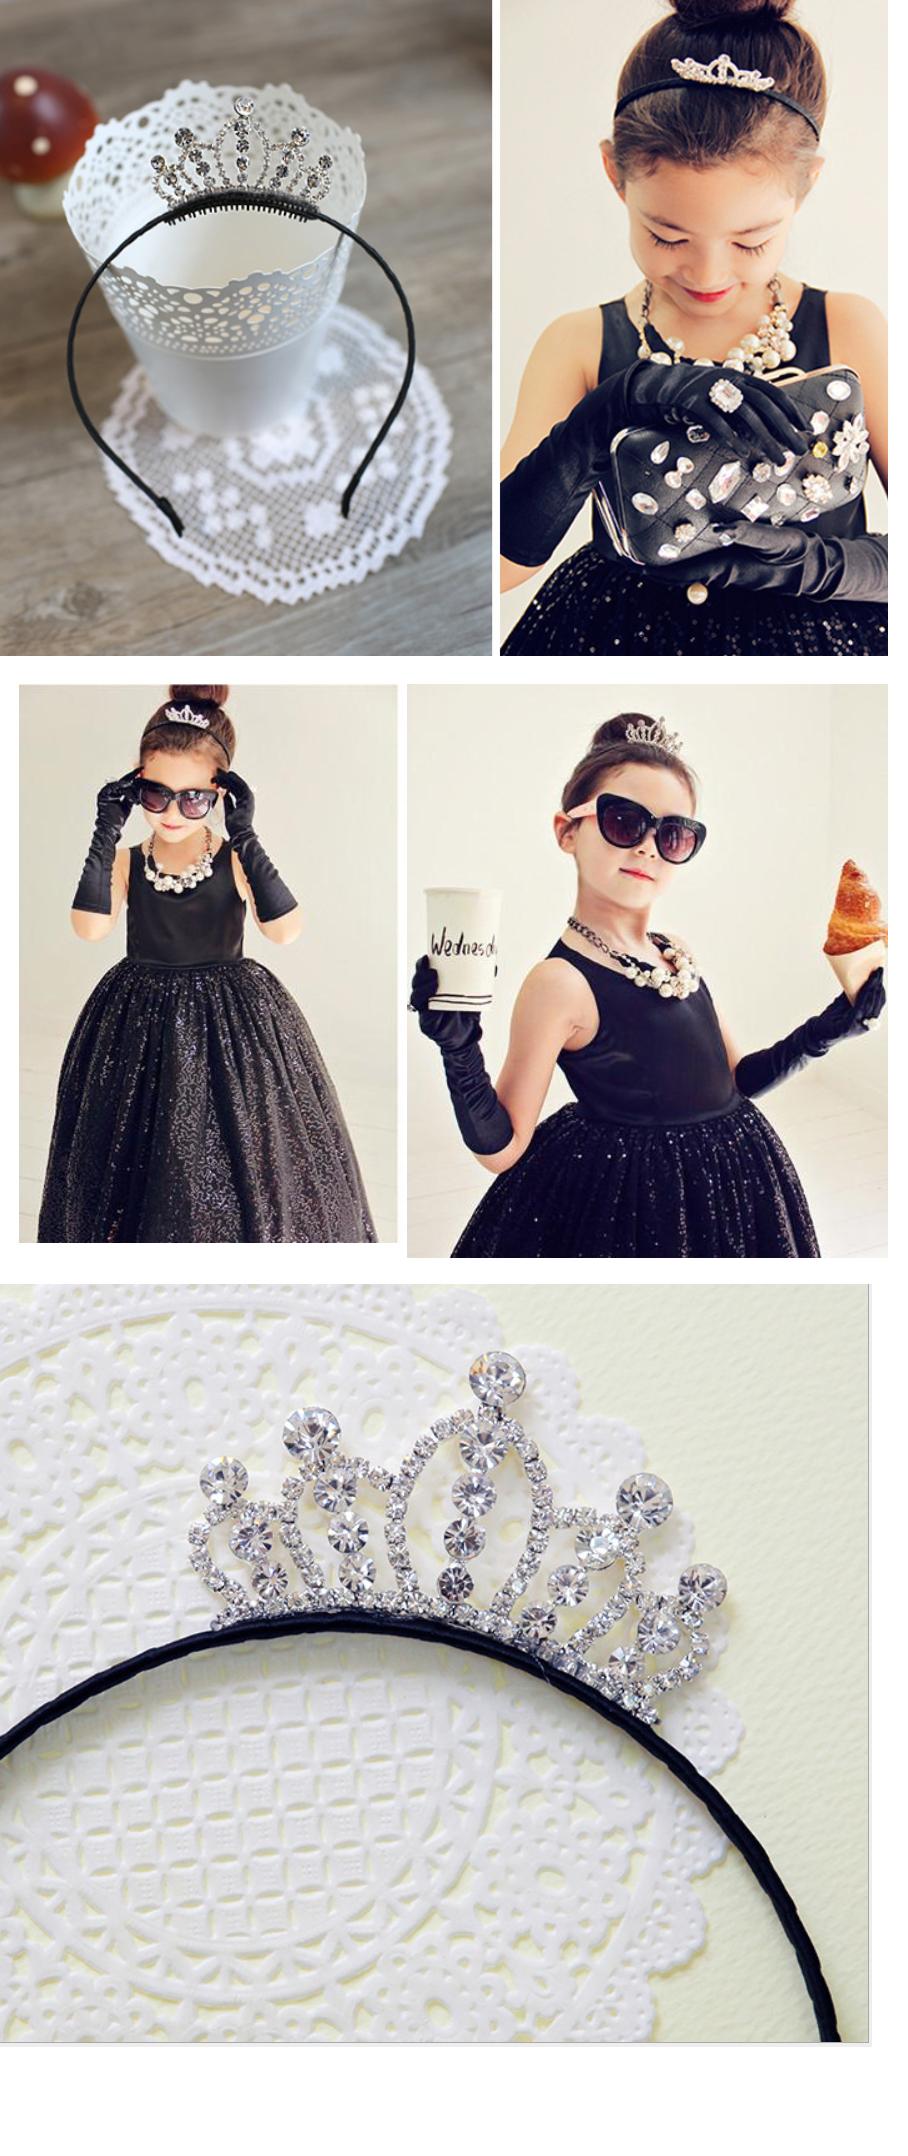 Princess Audrey Rhinestones Tiara Crown Hairband